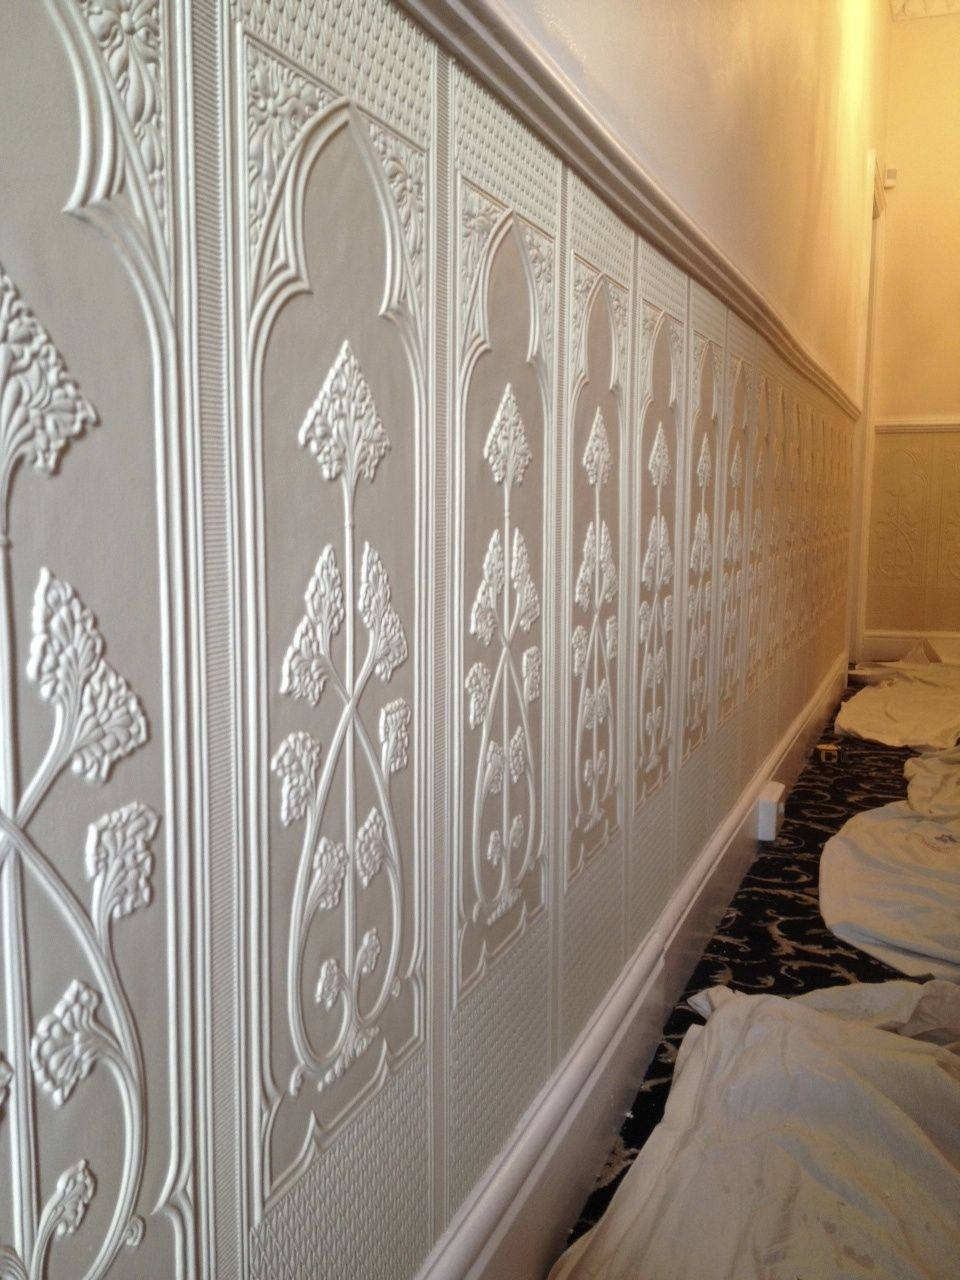 Lincrusta dado panels installation project in Cheshire Wall 960x1280